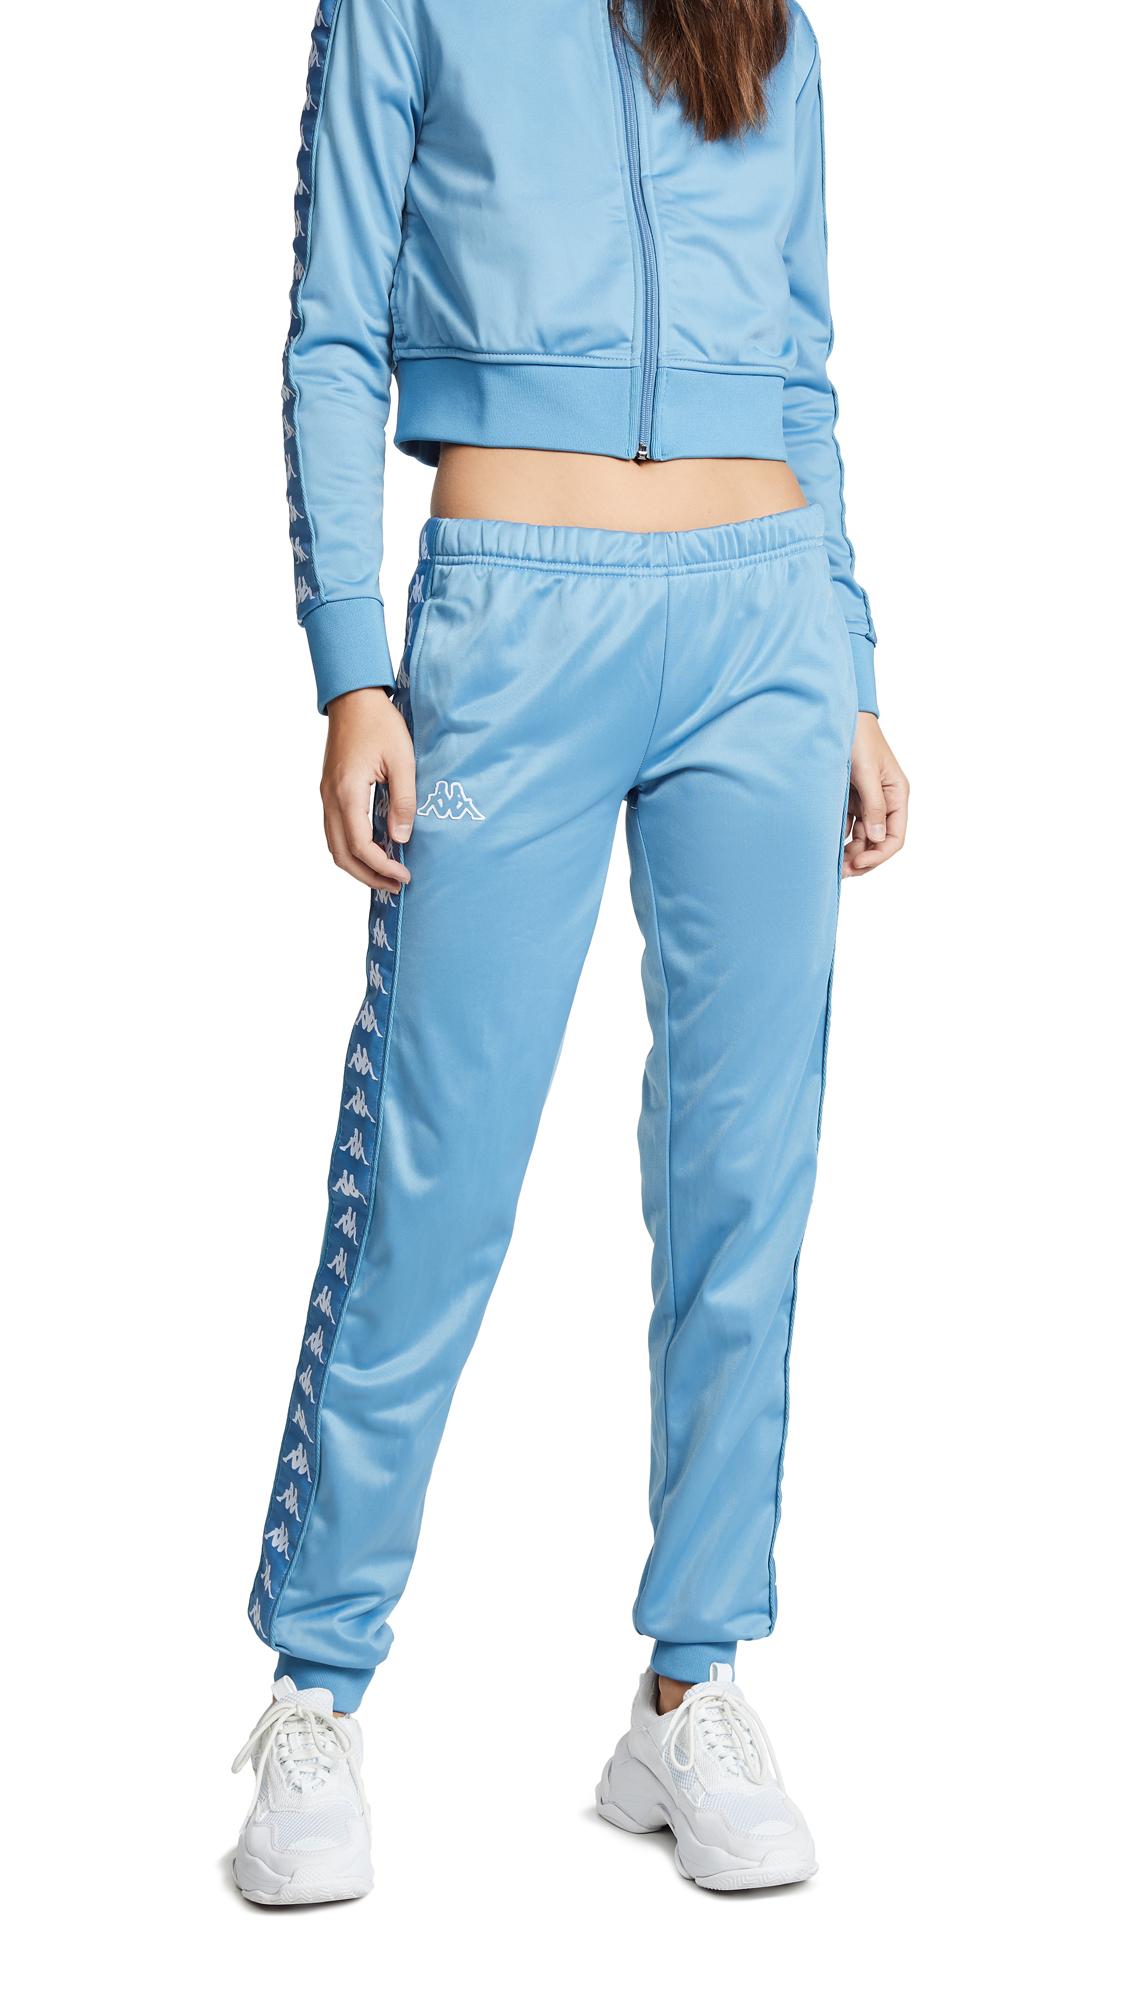 Kappa Banda Wrastoria Pants In Blue Cobalt/White